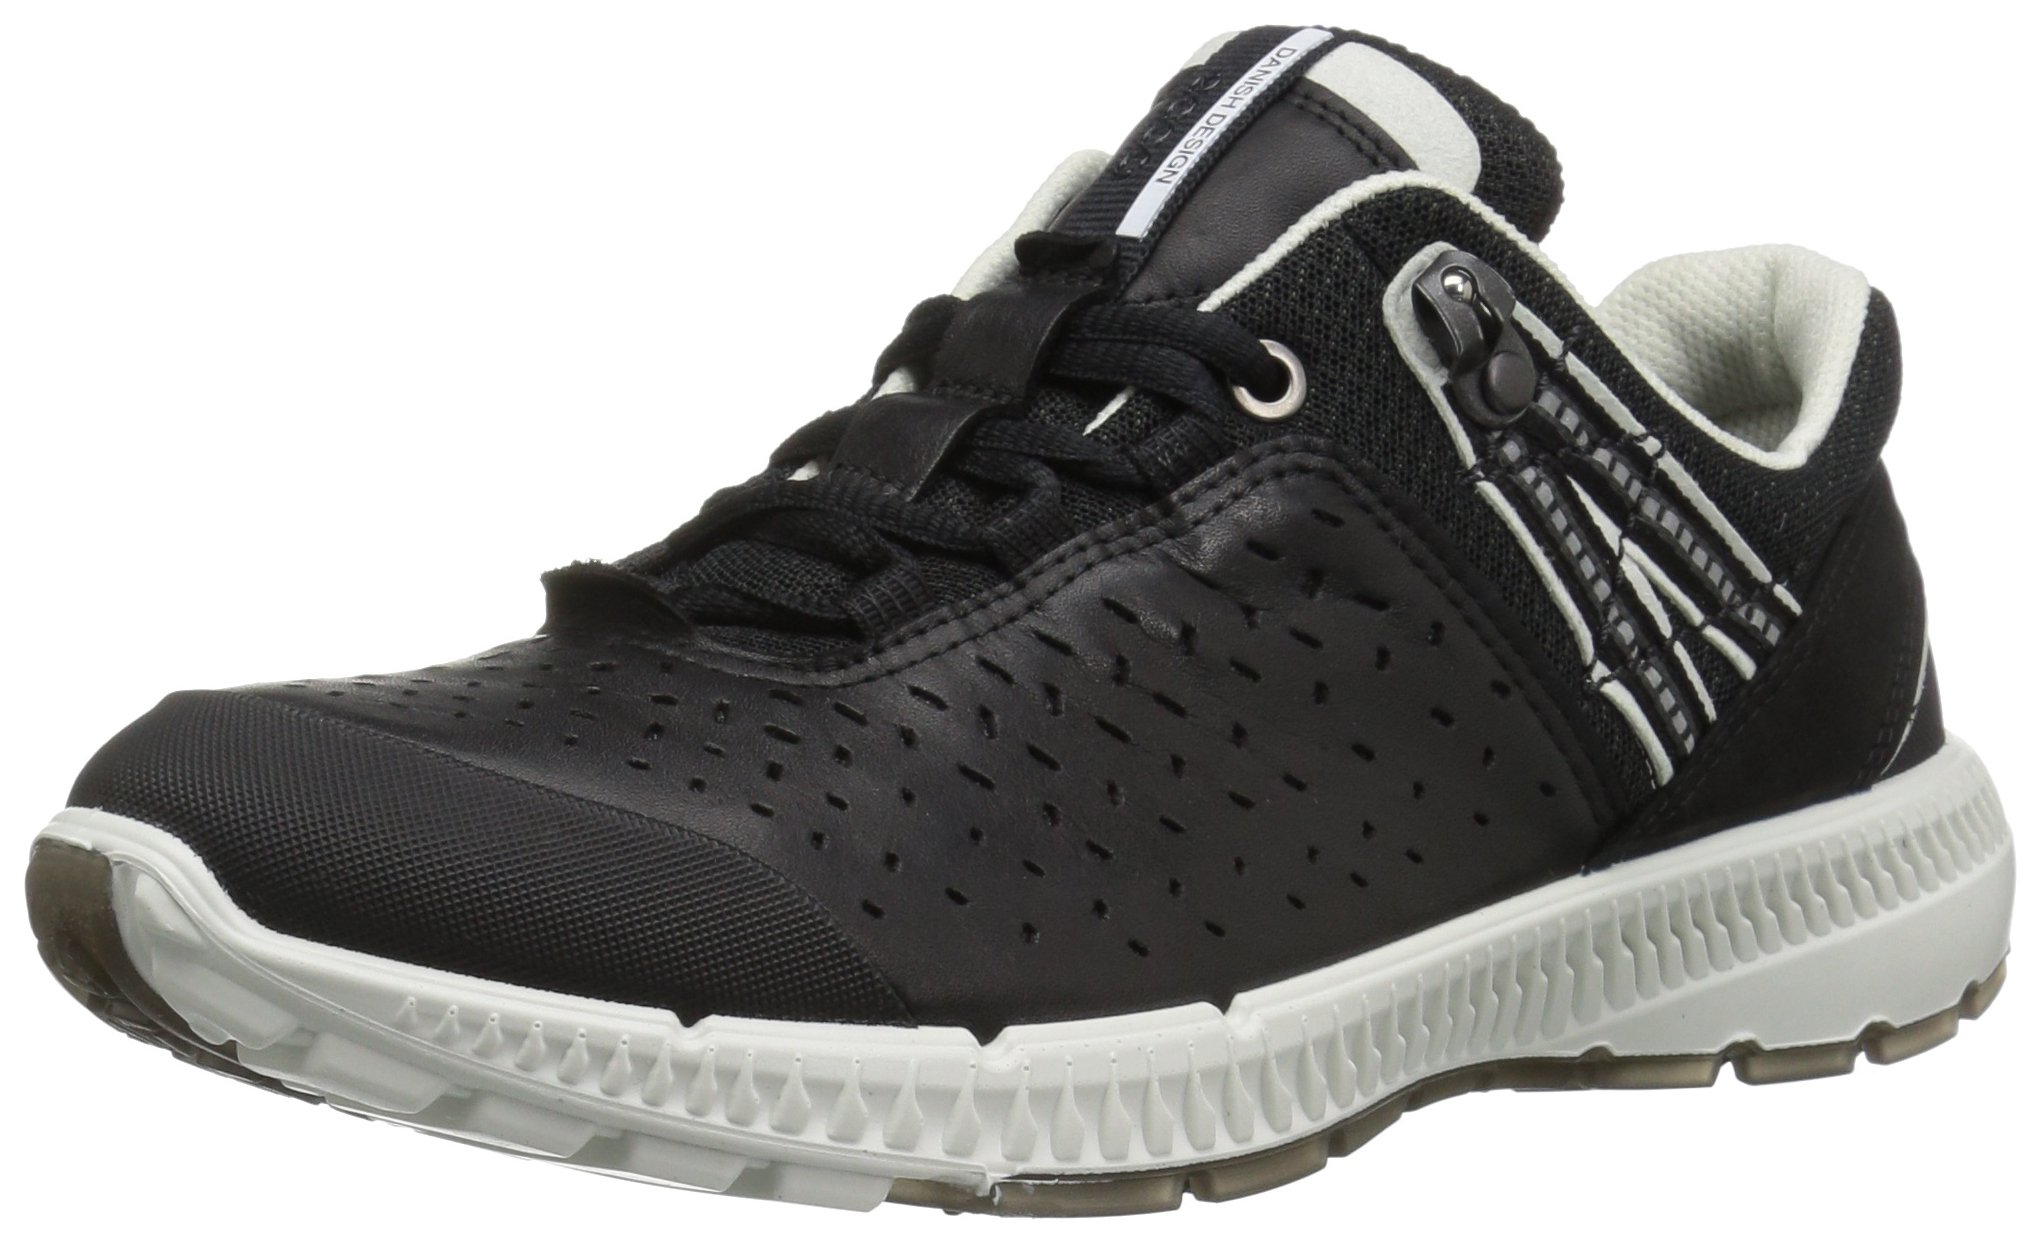 TrSneakers Eu Intrinsic FemmeNoir Basses Black40 Ecco 7yYbfIgm6v